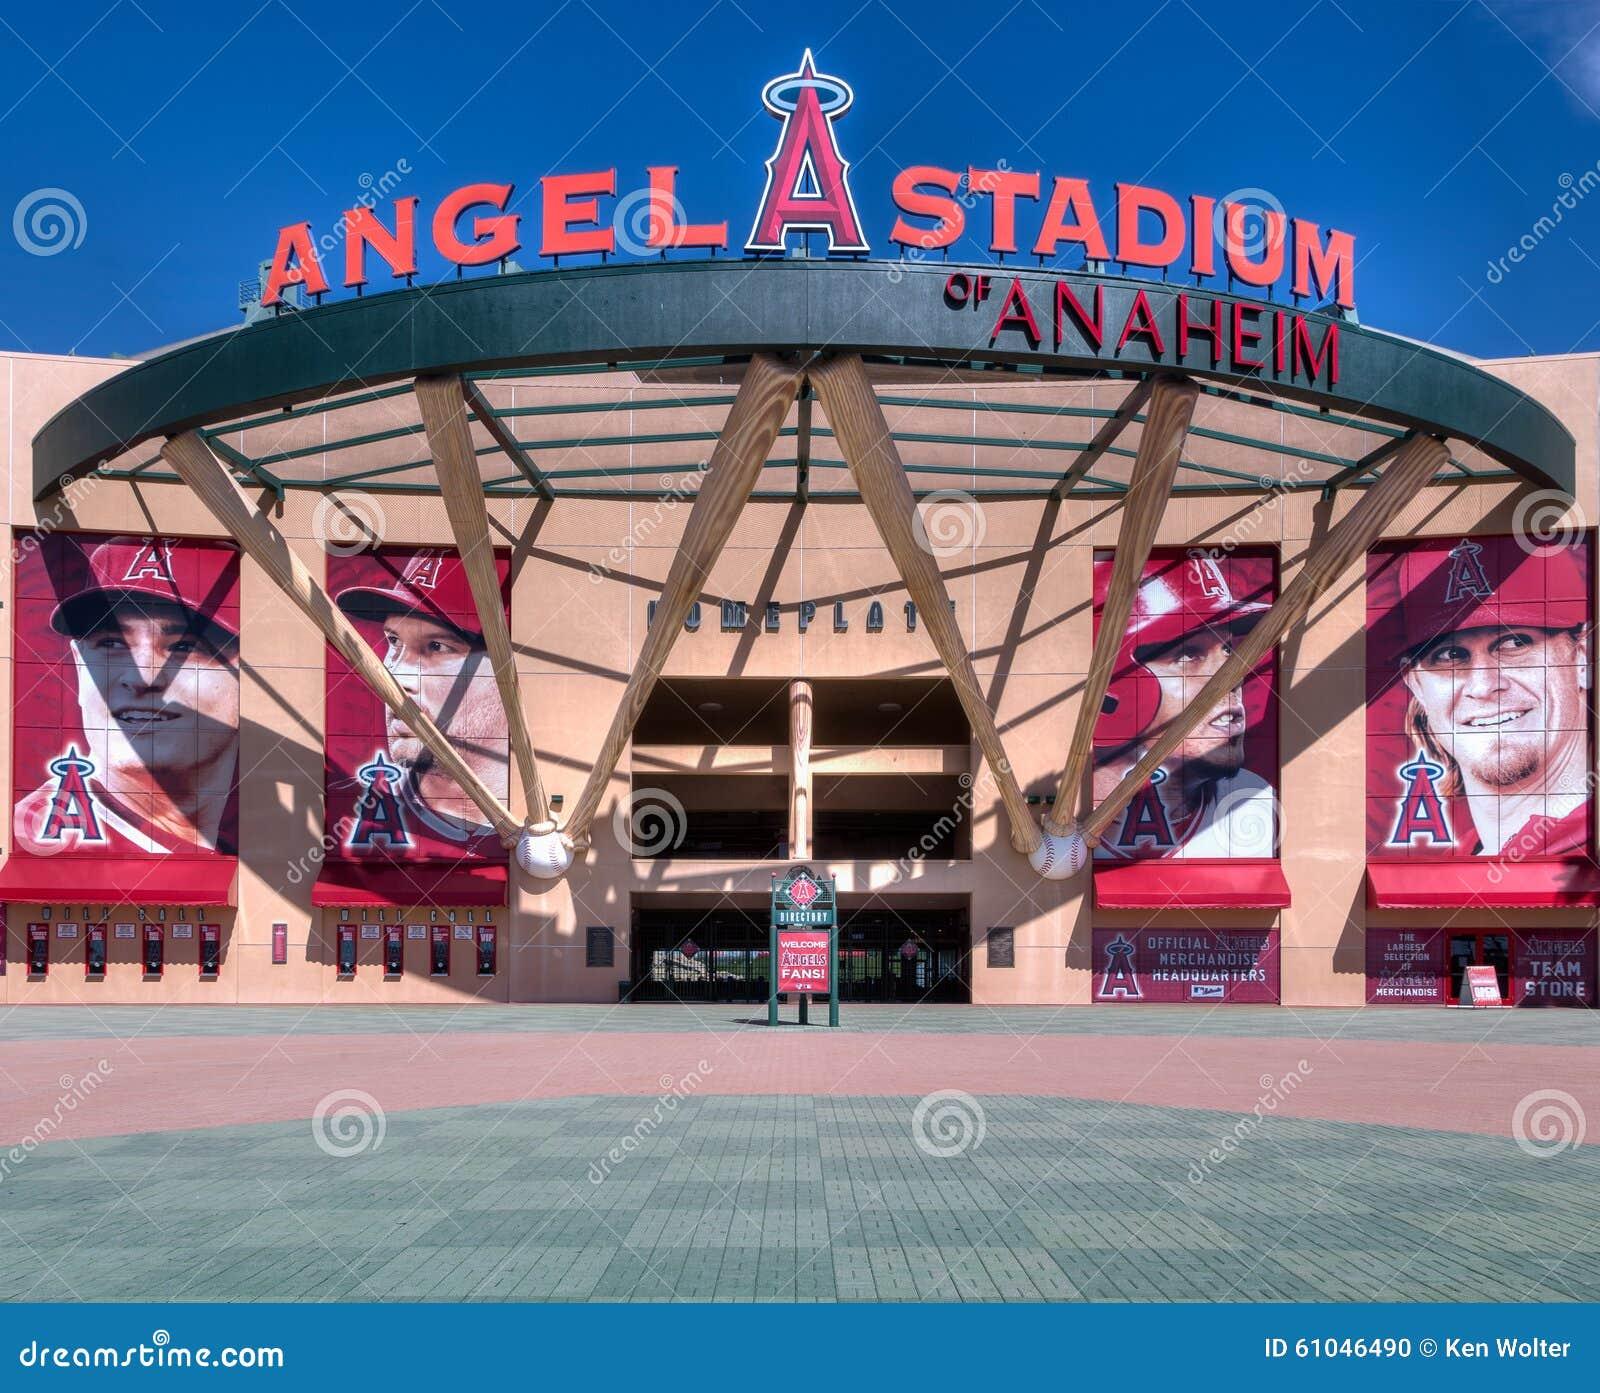 Entrada del Angel Stadium of Anaheim